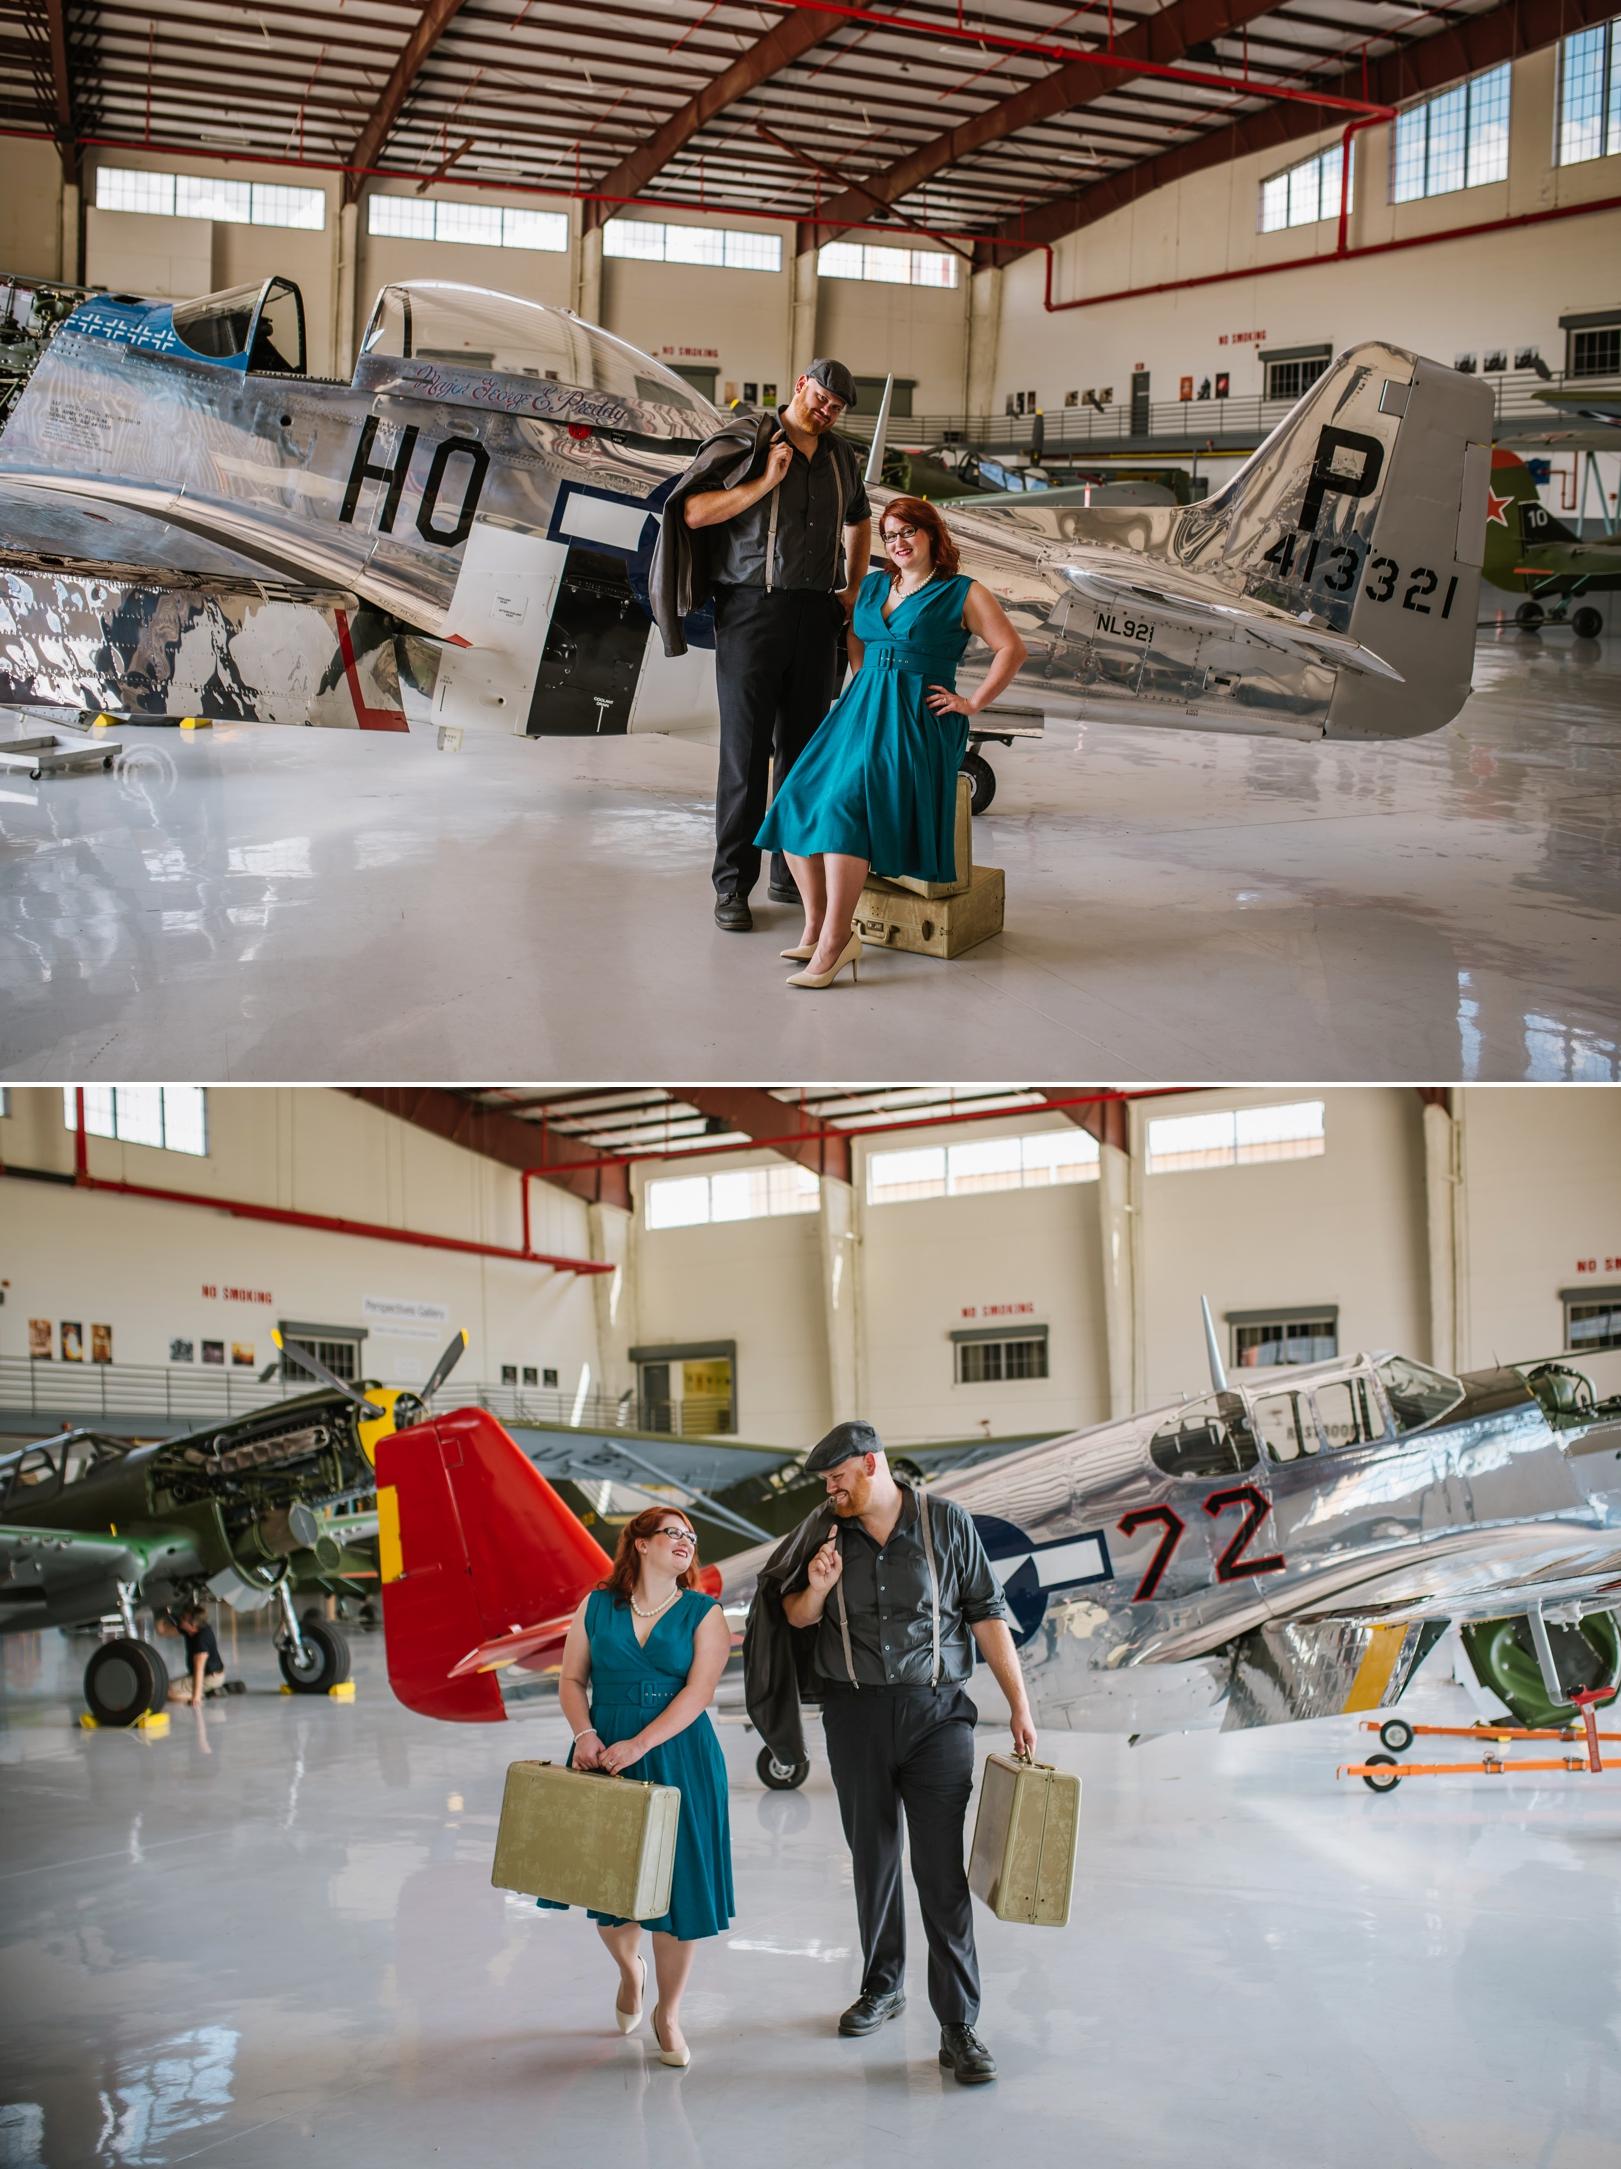 fantasy-of-flight-aviation-themed-engagement-photos-lakeland-florida_0002.jpg